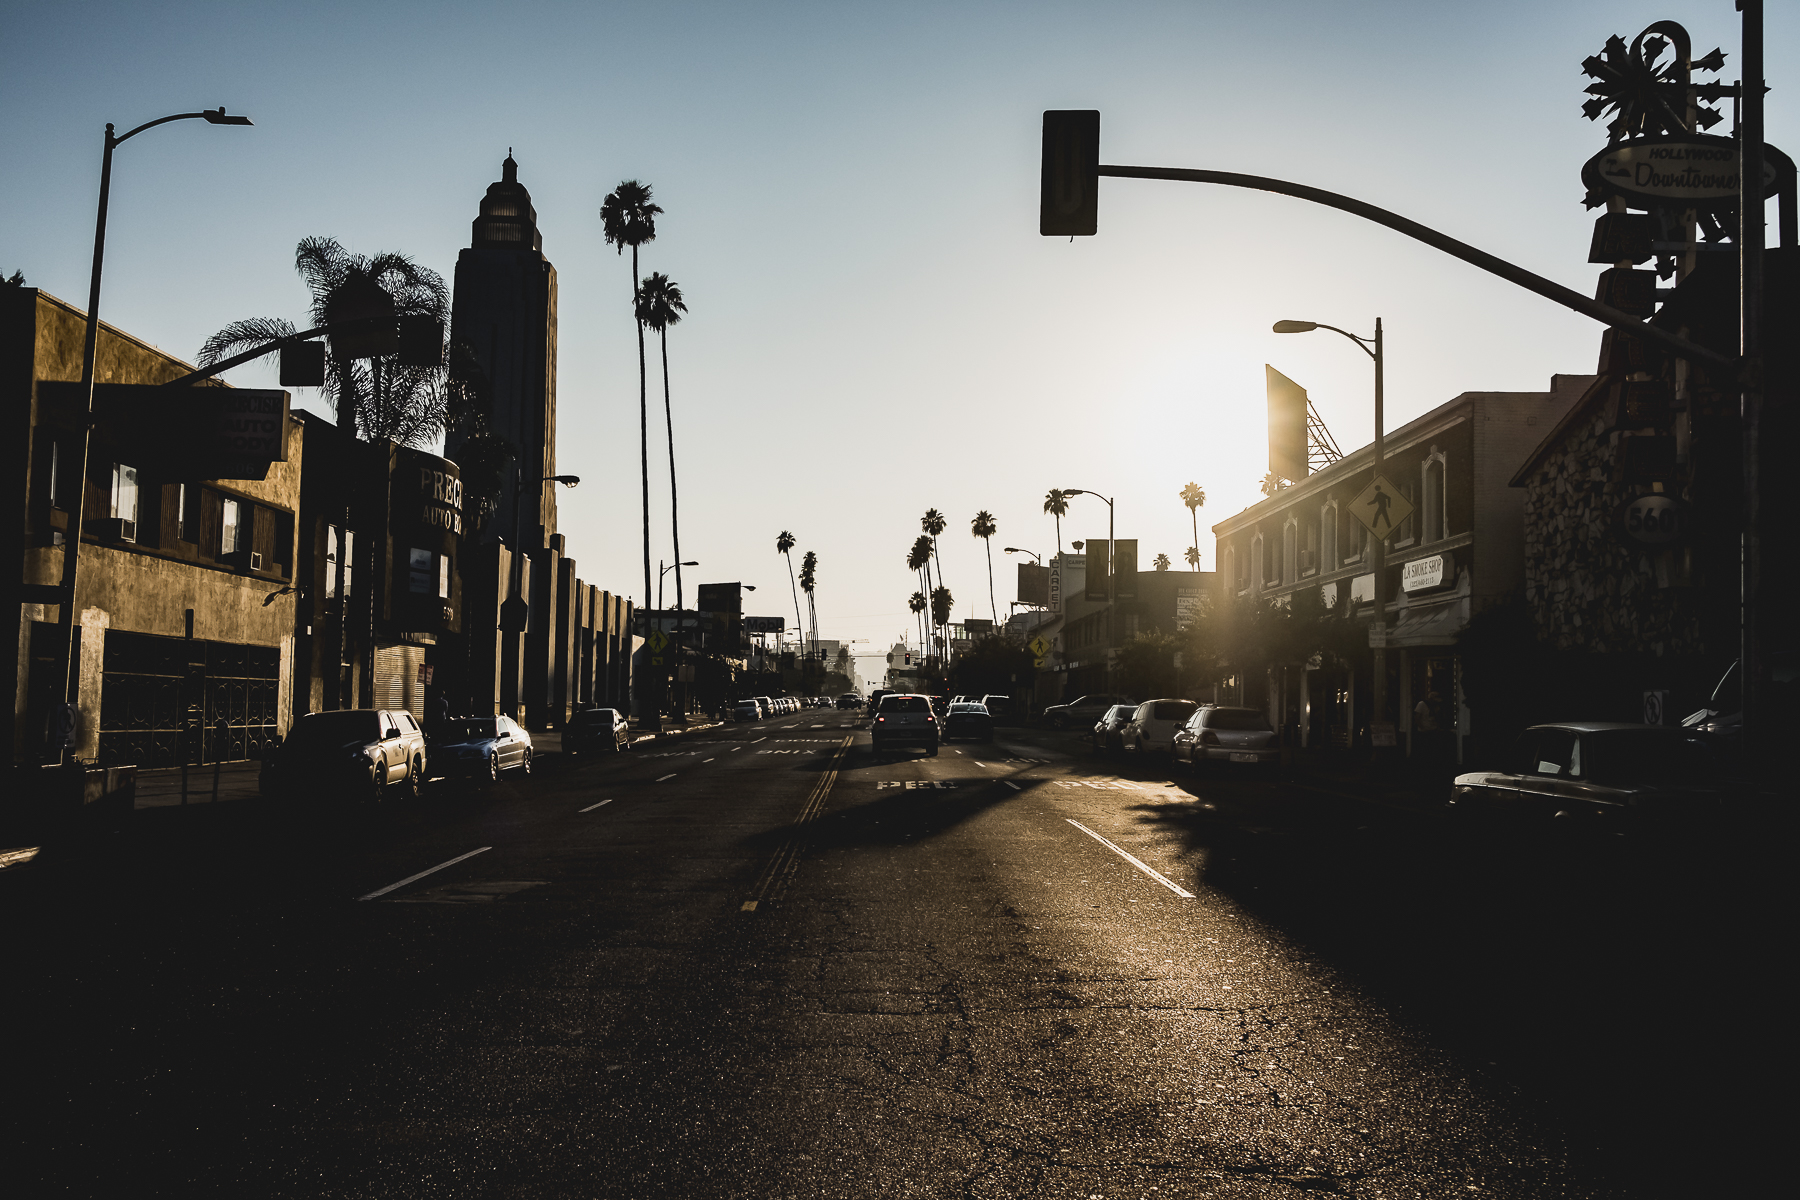 Streetphotography Los Ángeles / Zaragoza Walkers